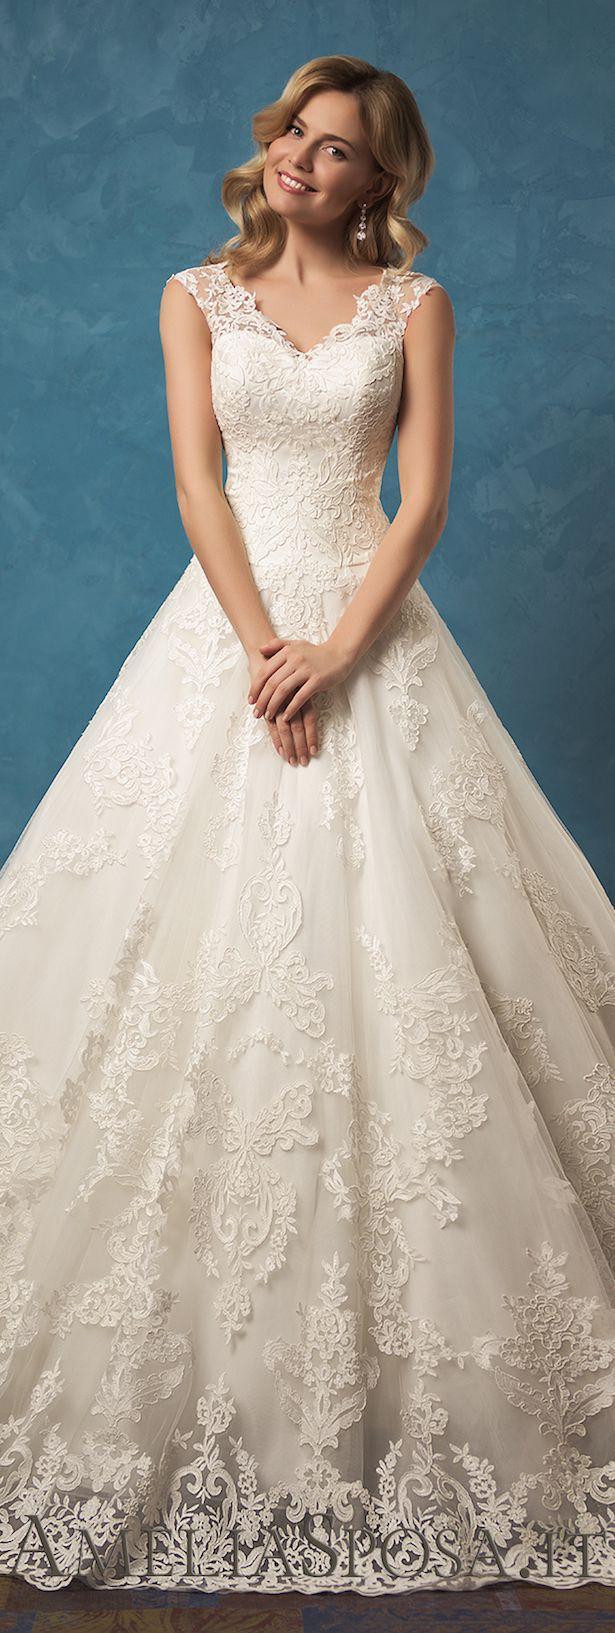 White dress design 2017 - Amelia Sposa 2017 Wedding Dress